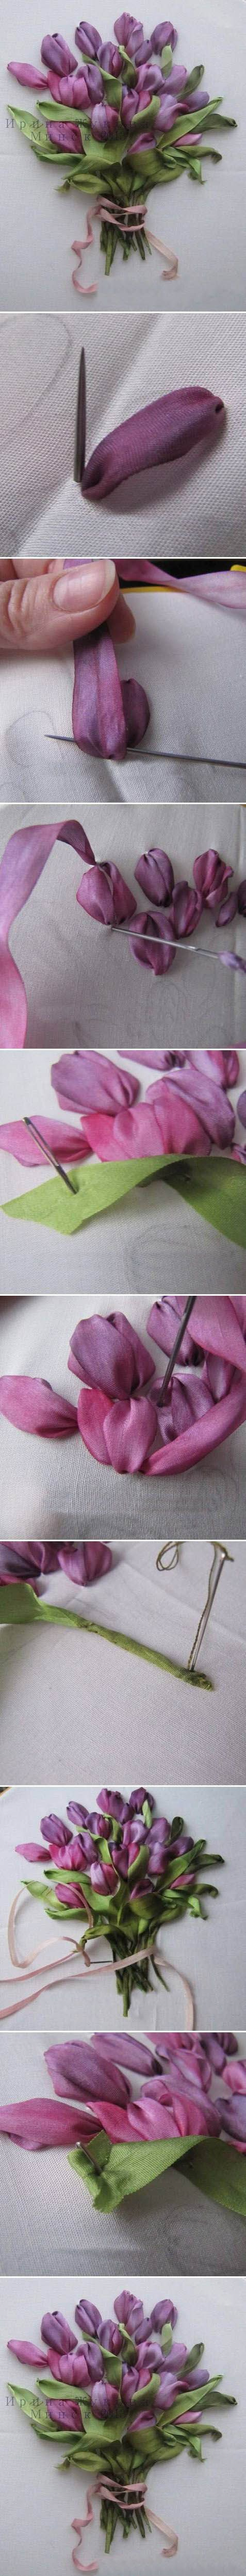 Beautiful Flowers | DIY & Crafts Tutorials